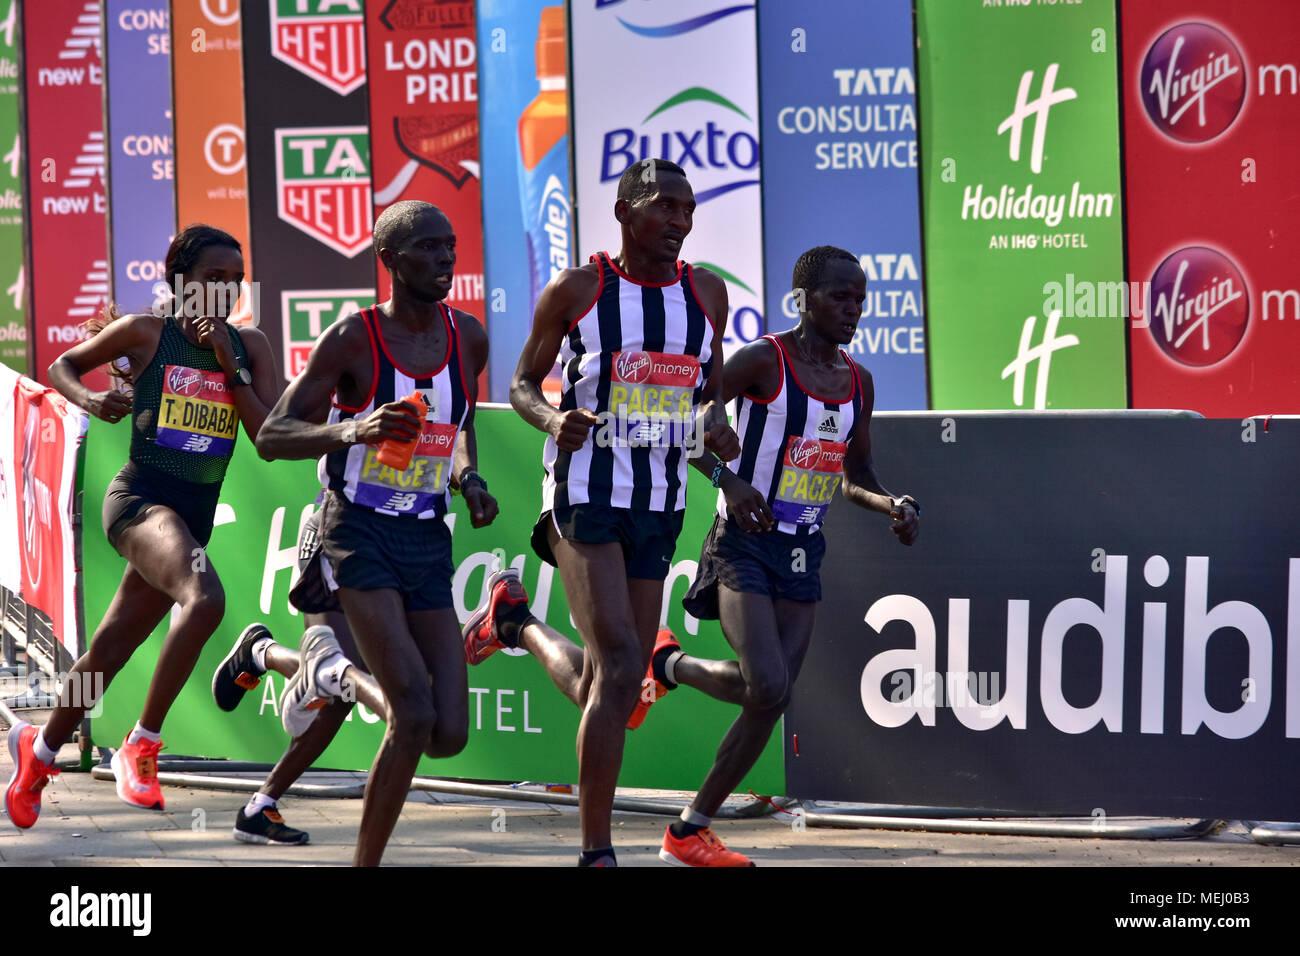 London, UK. 22nd Apr, 2018. The Virgin Money London Marathon 2018 ;  #LondonMarathon ; runners Credit: Marcin Libera/Alamy Live News Stock Photo